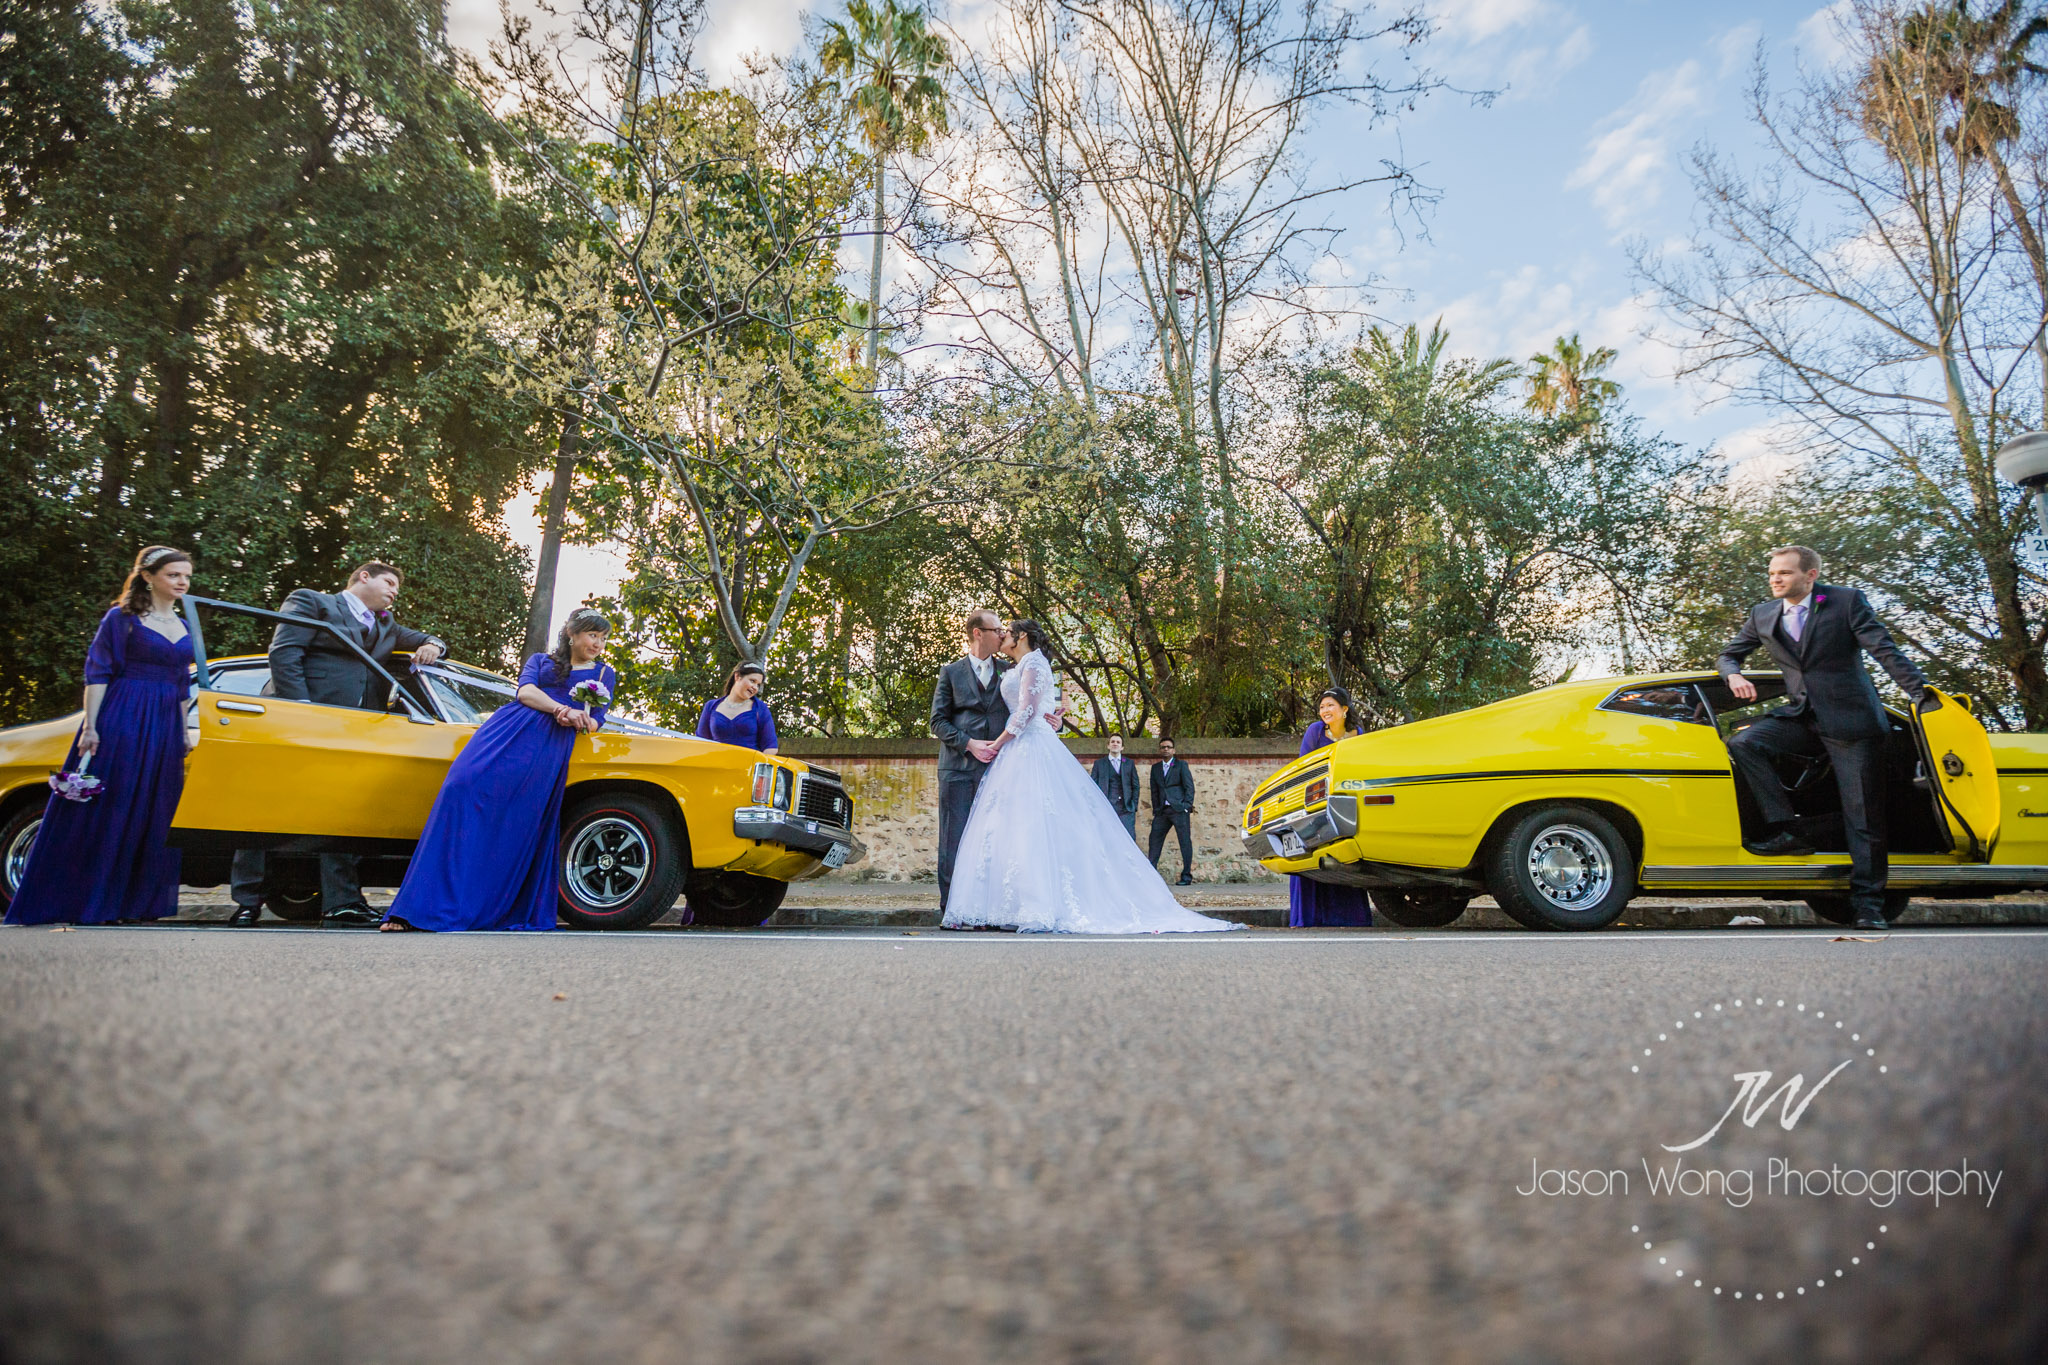 wedding-car-sunny-day.jpg